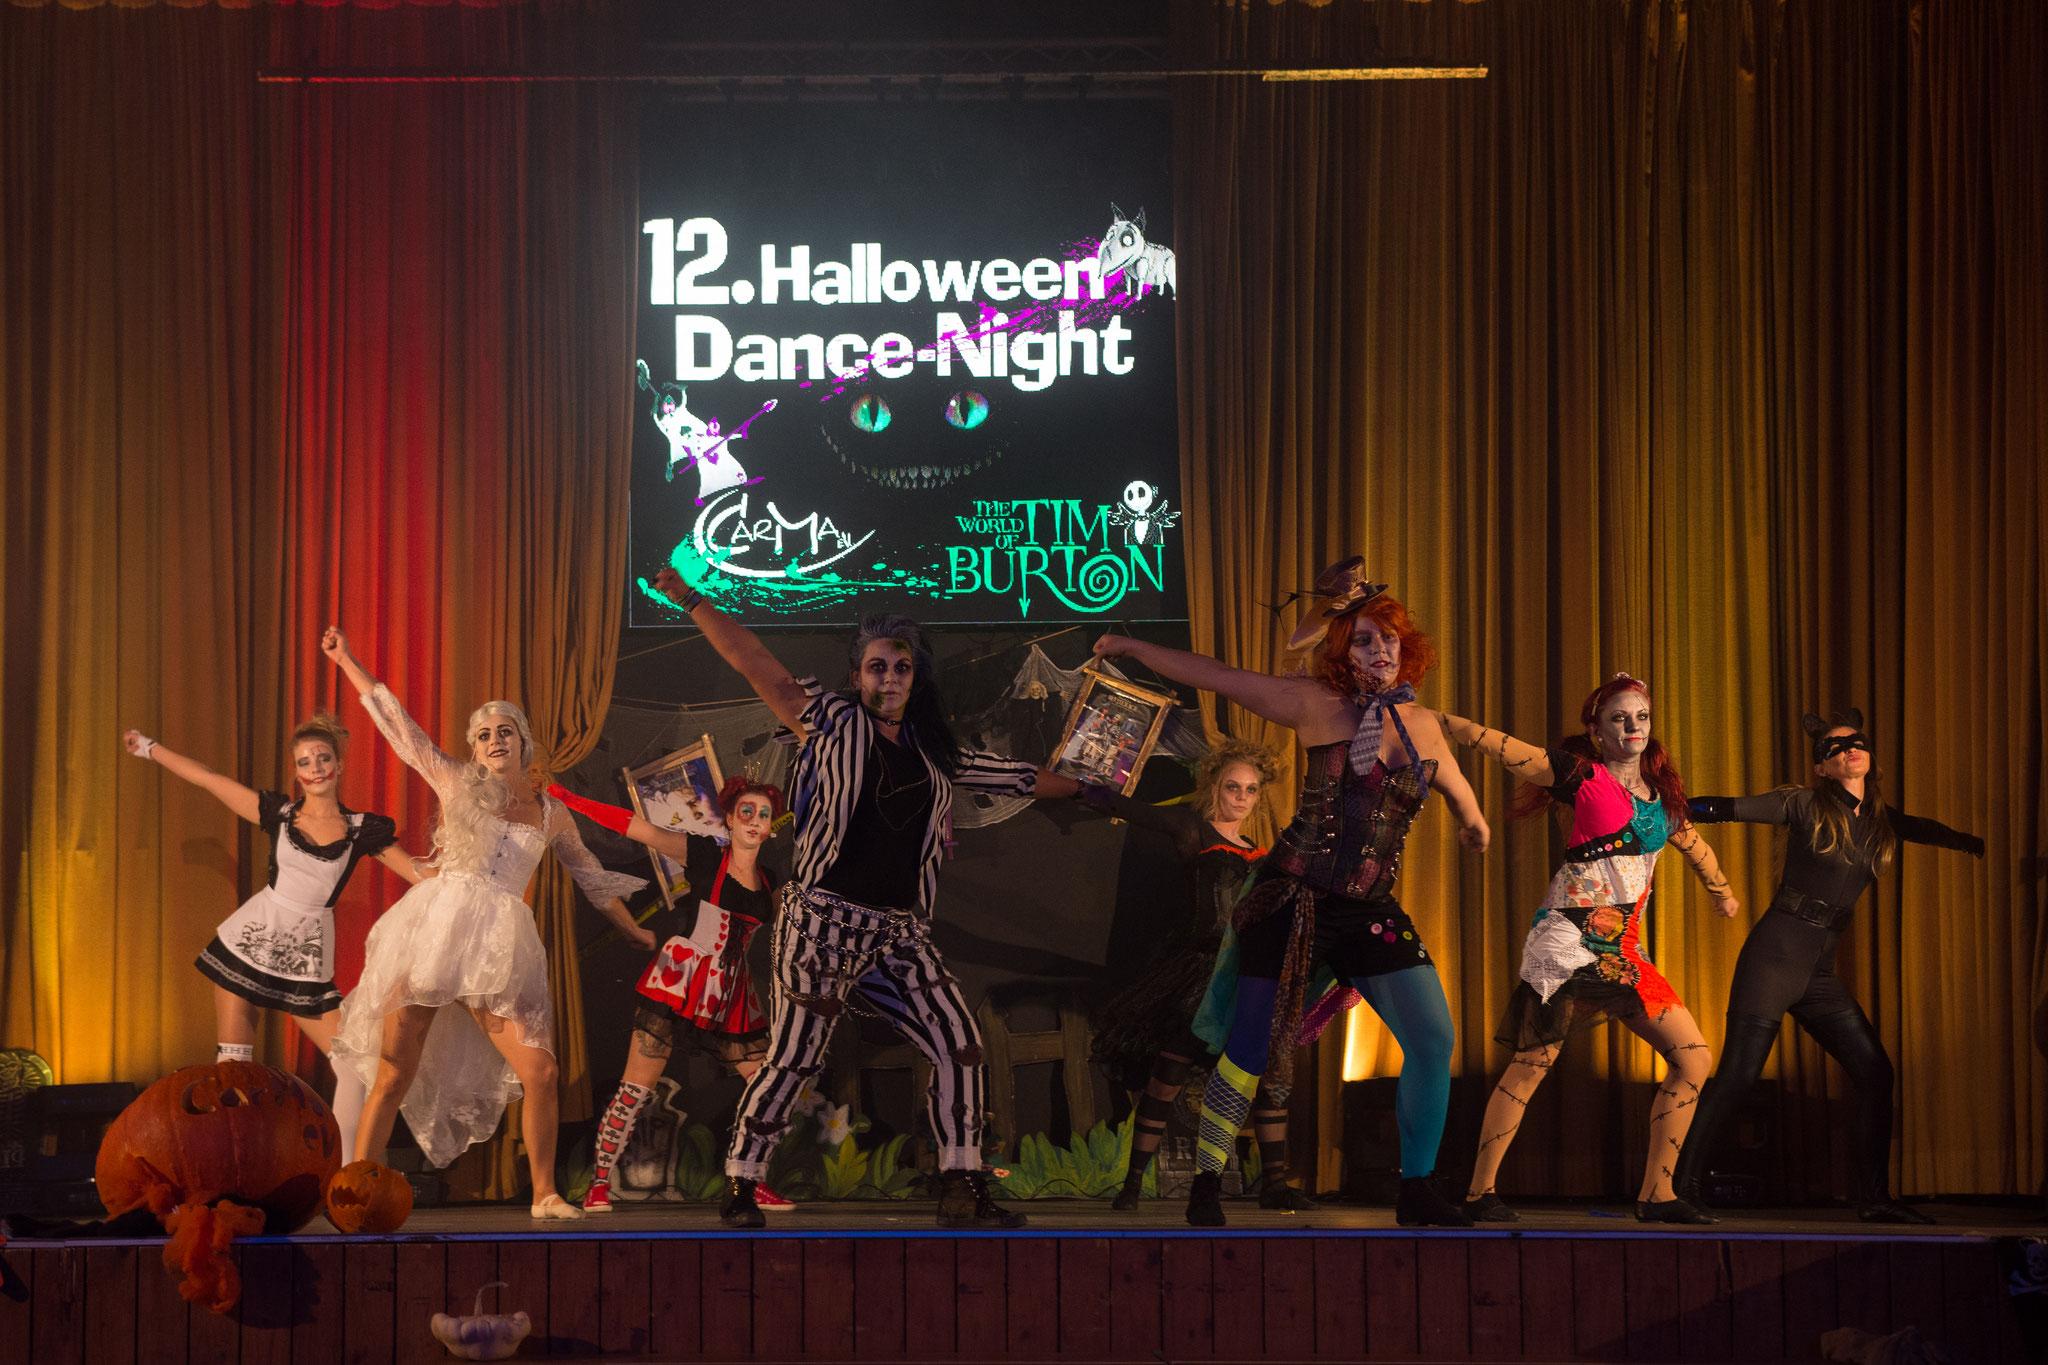 Eröffnung 12. Halloween-Dance-Night